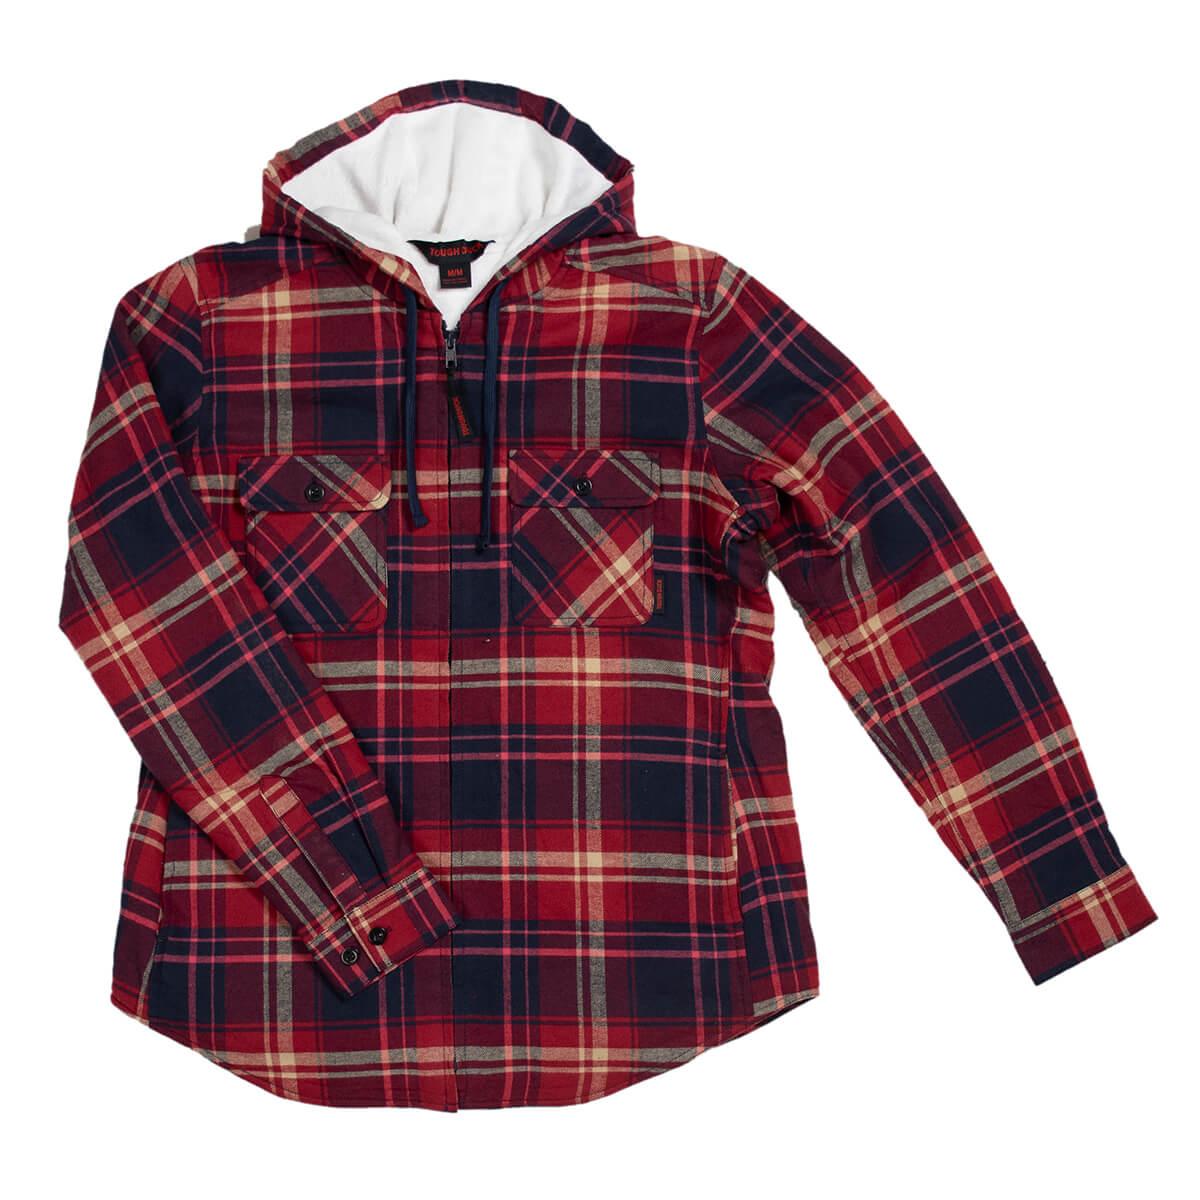 Women's Plush Lined Jacket